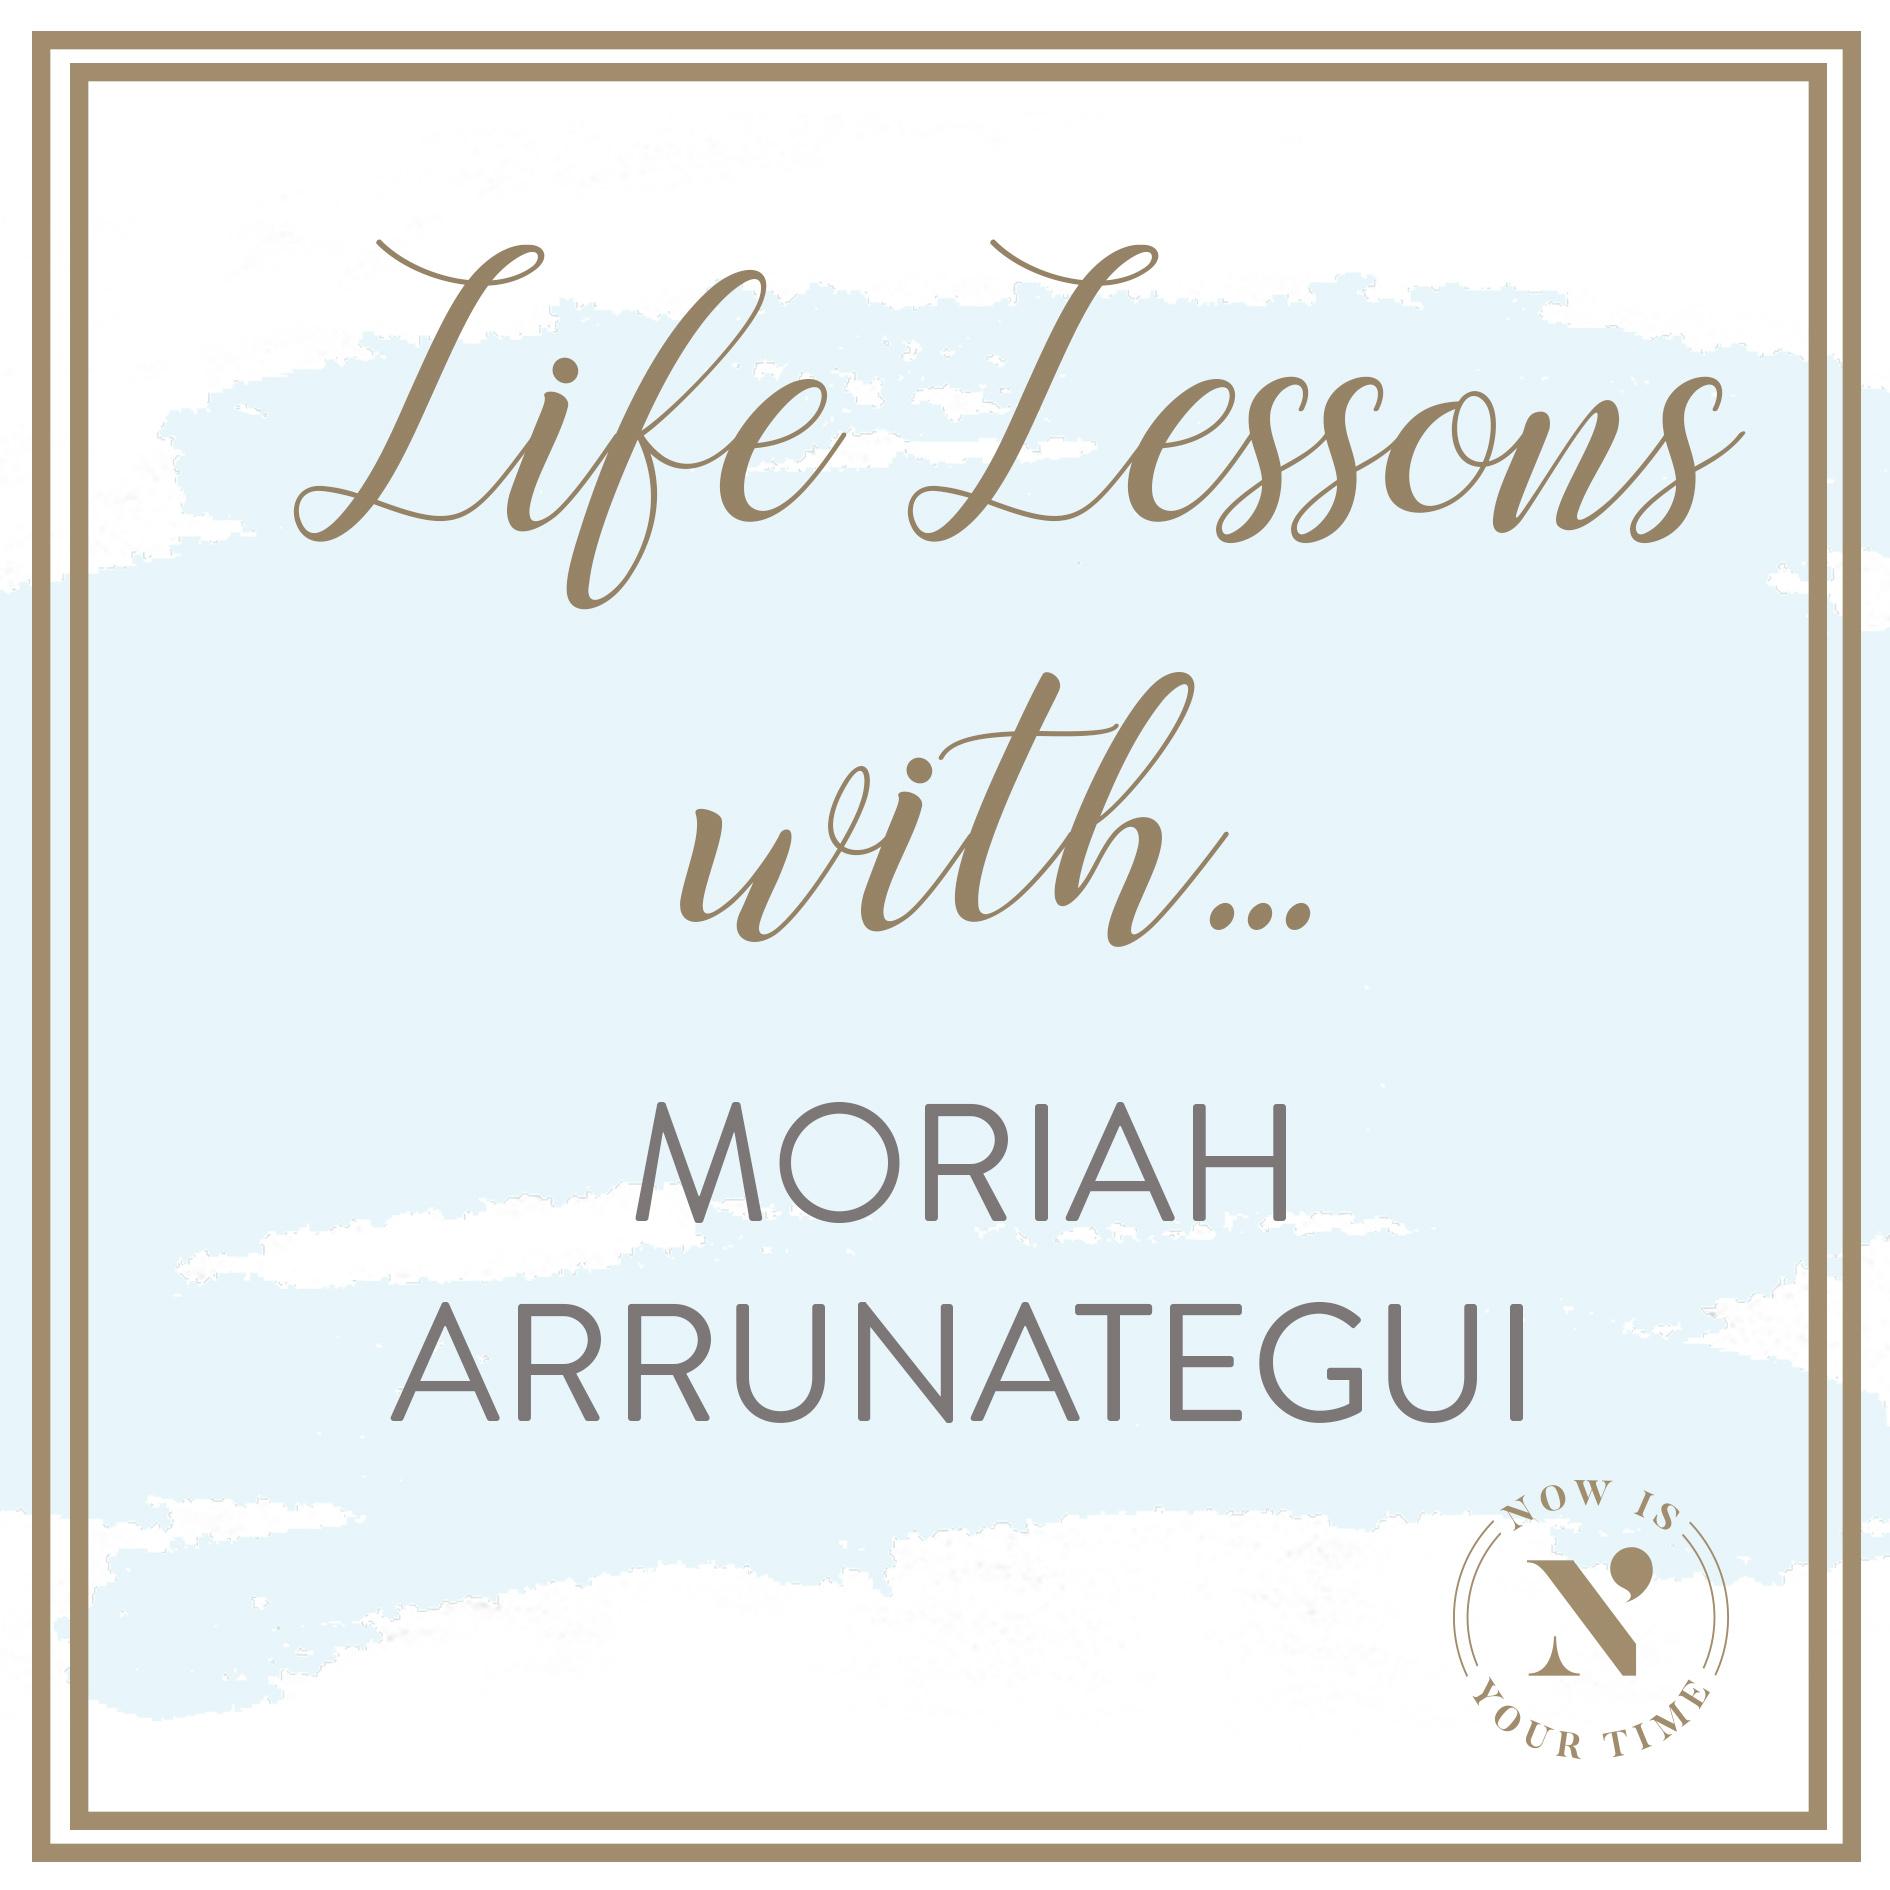 Life Lessons with podcast artwork - MORIAH ARRUNATEGUI.jpg